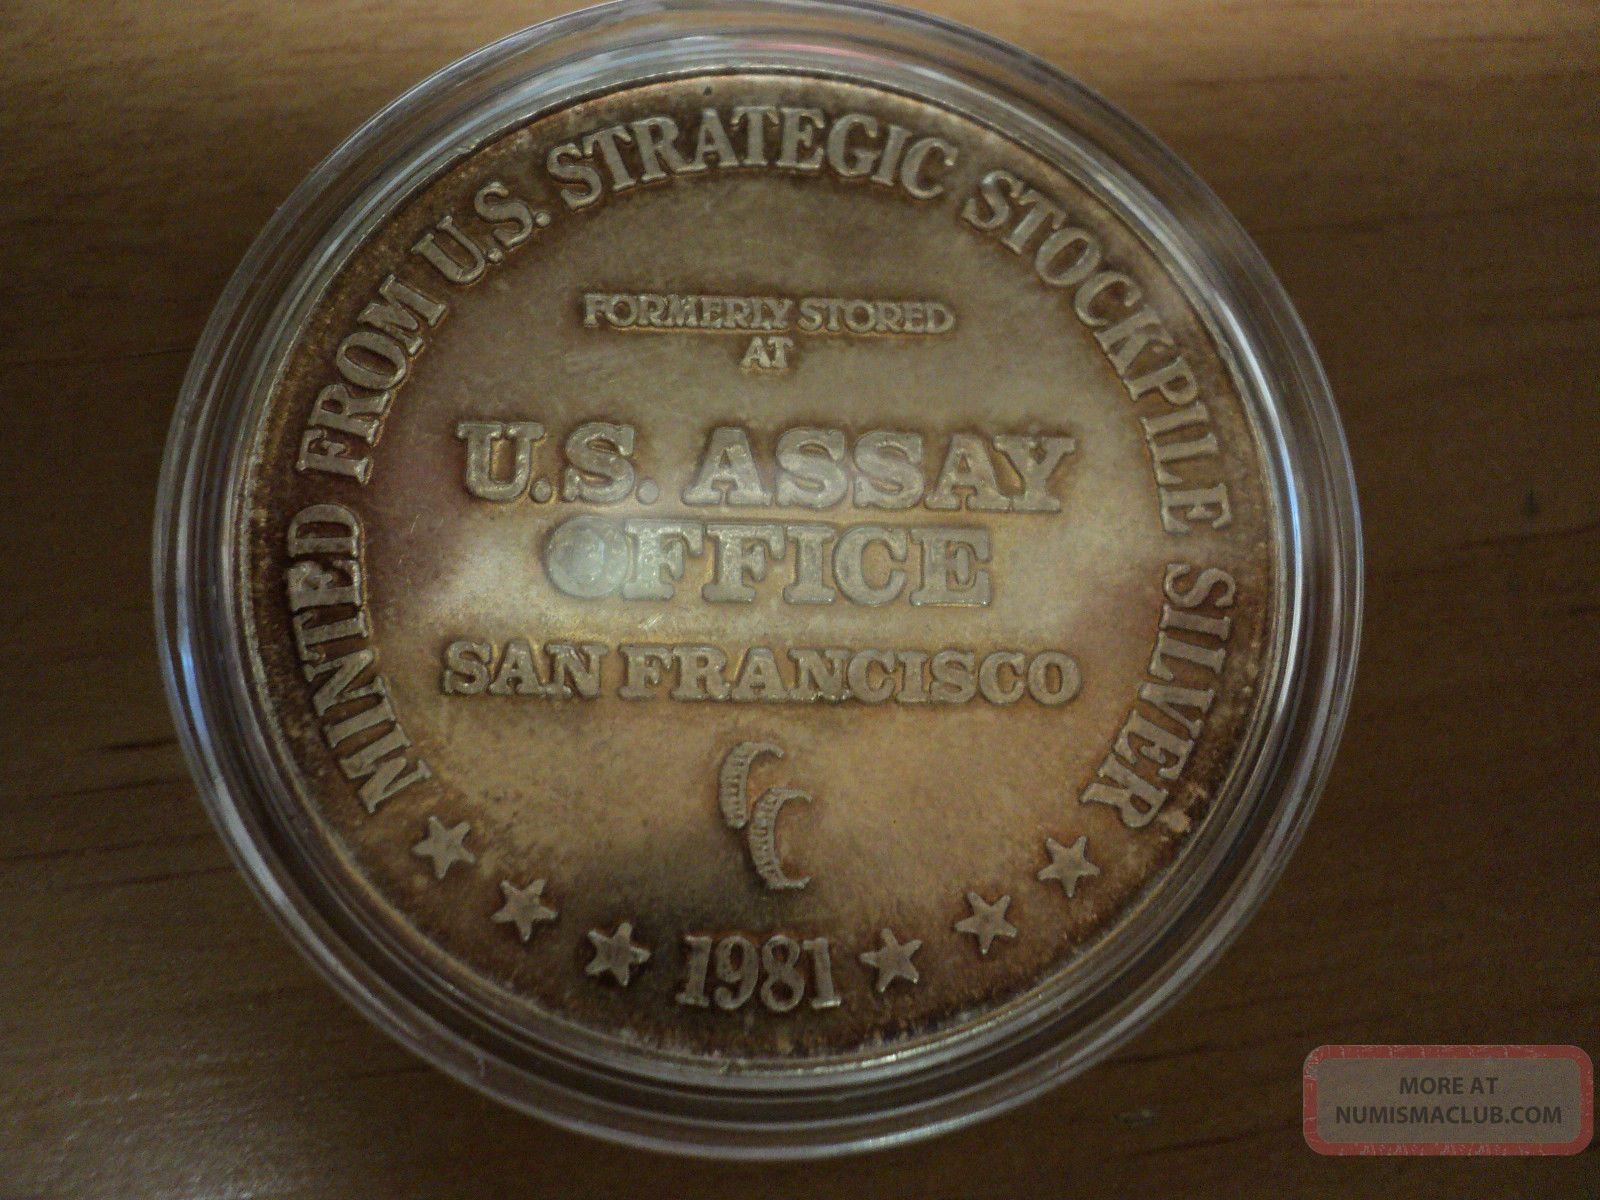 1981 U S Assay Office San Francisco One Troy Ounce